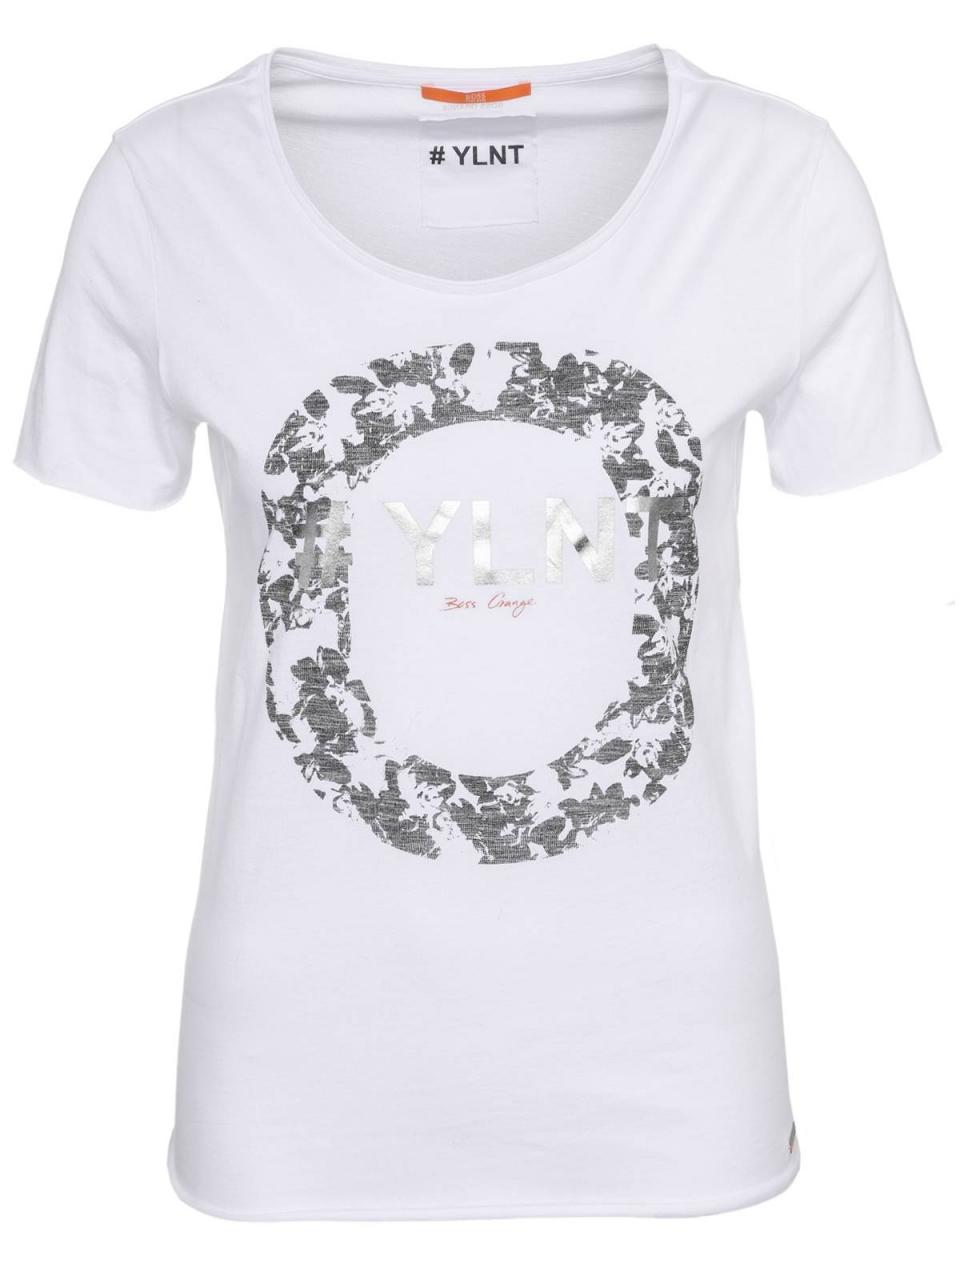 BOSS ORANGE T-Shirt Tishirt mit Front-Print